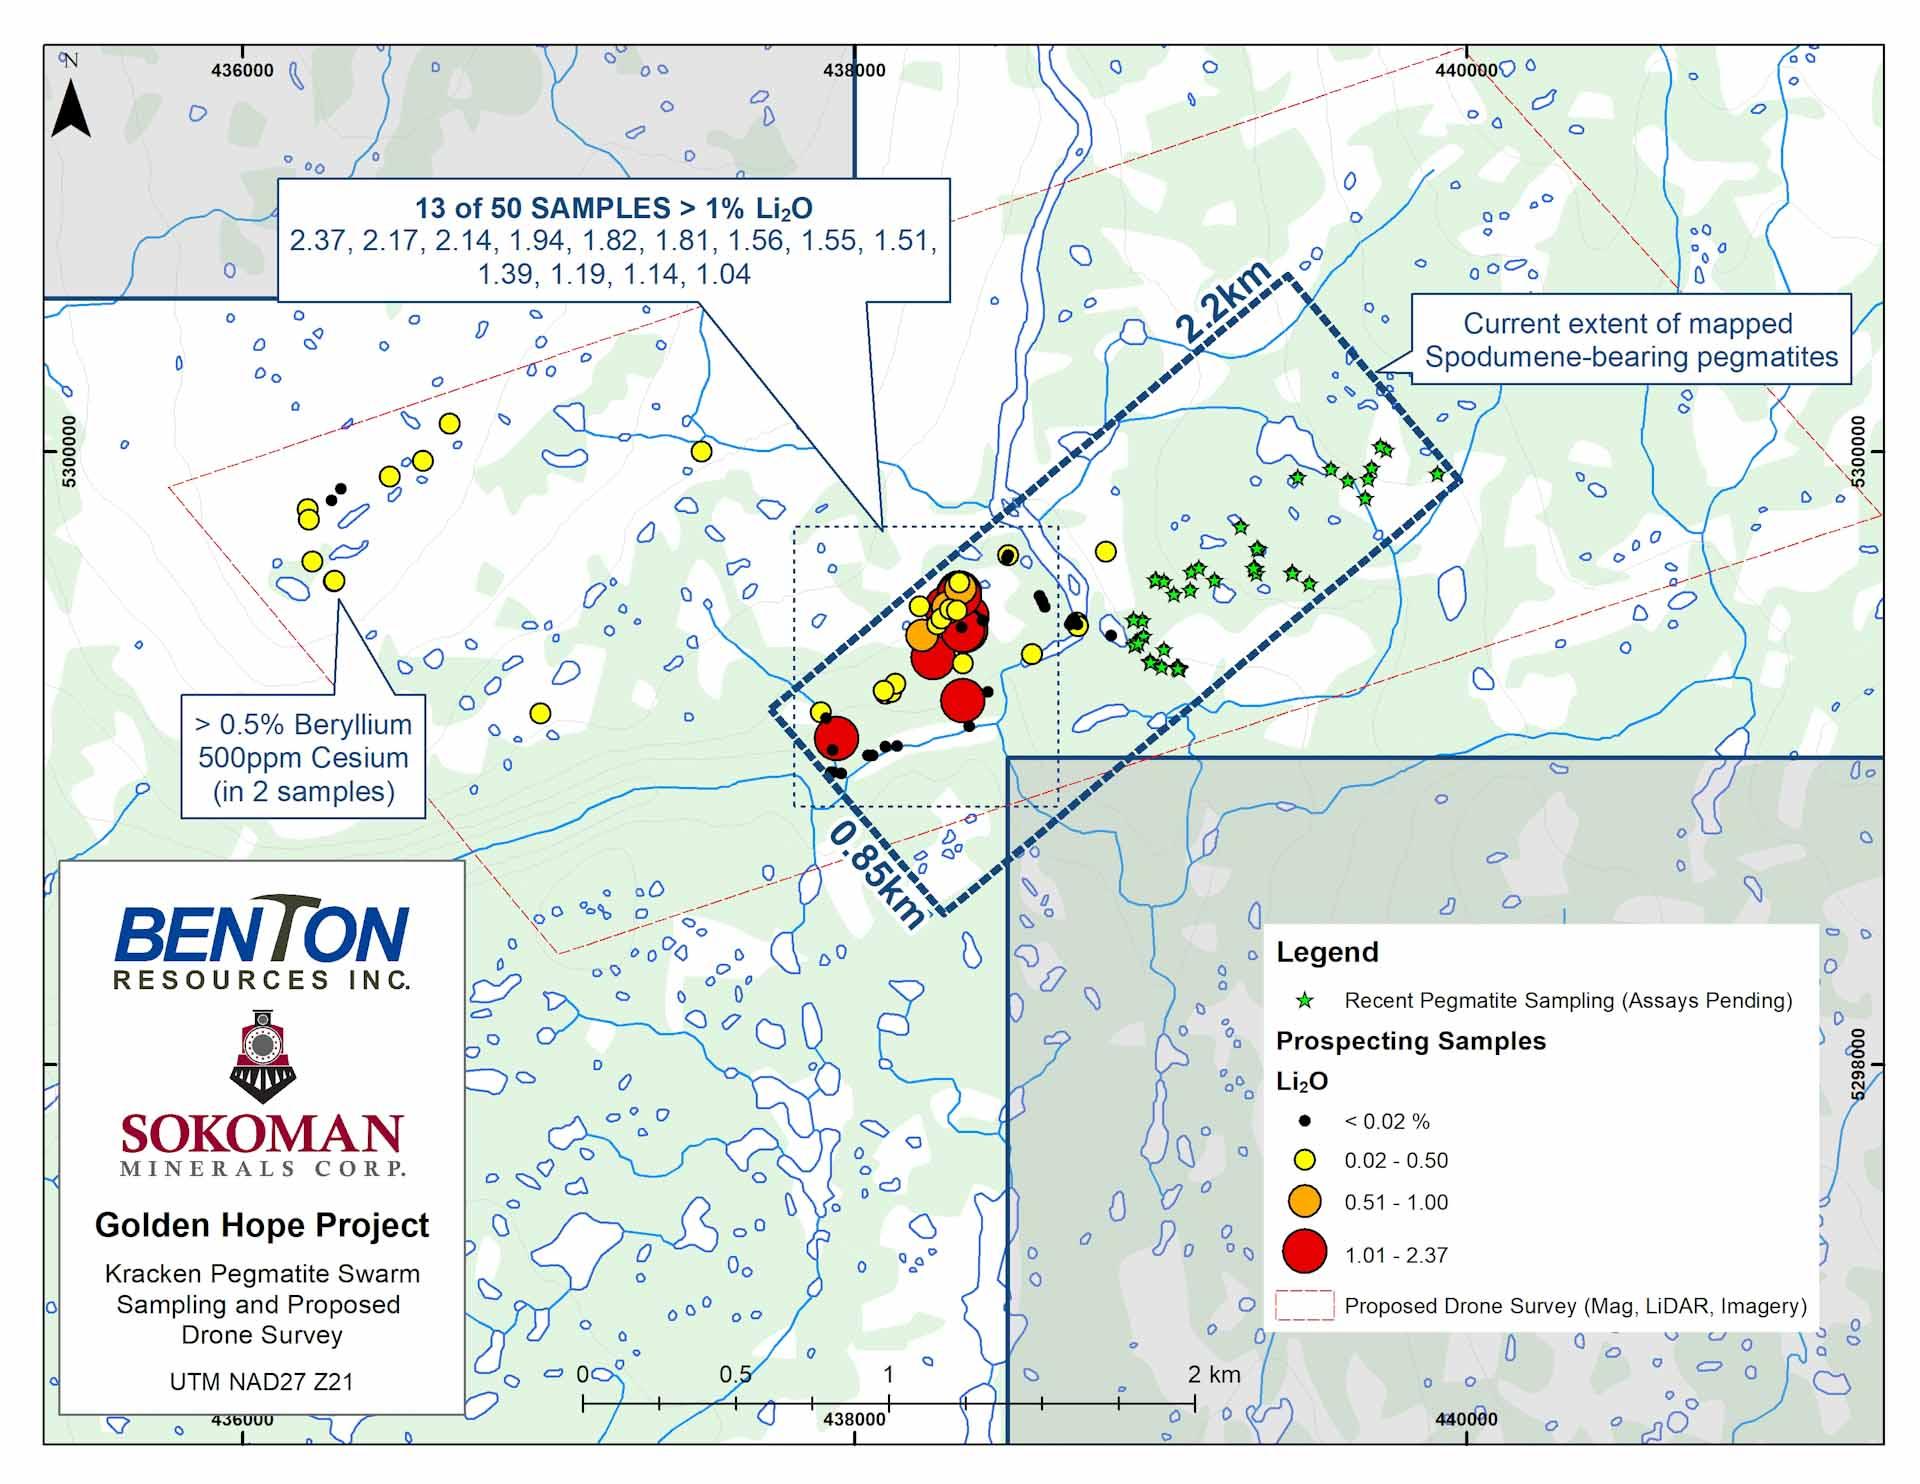 GH Sampling Update,Sokoman Minerals,Benton Resources